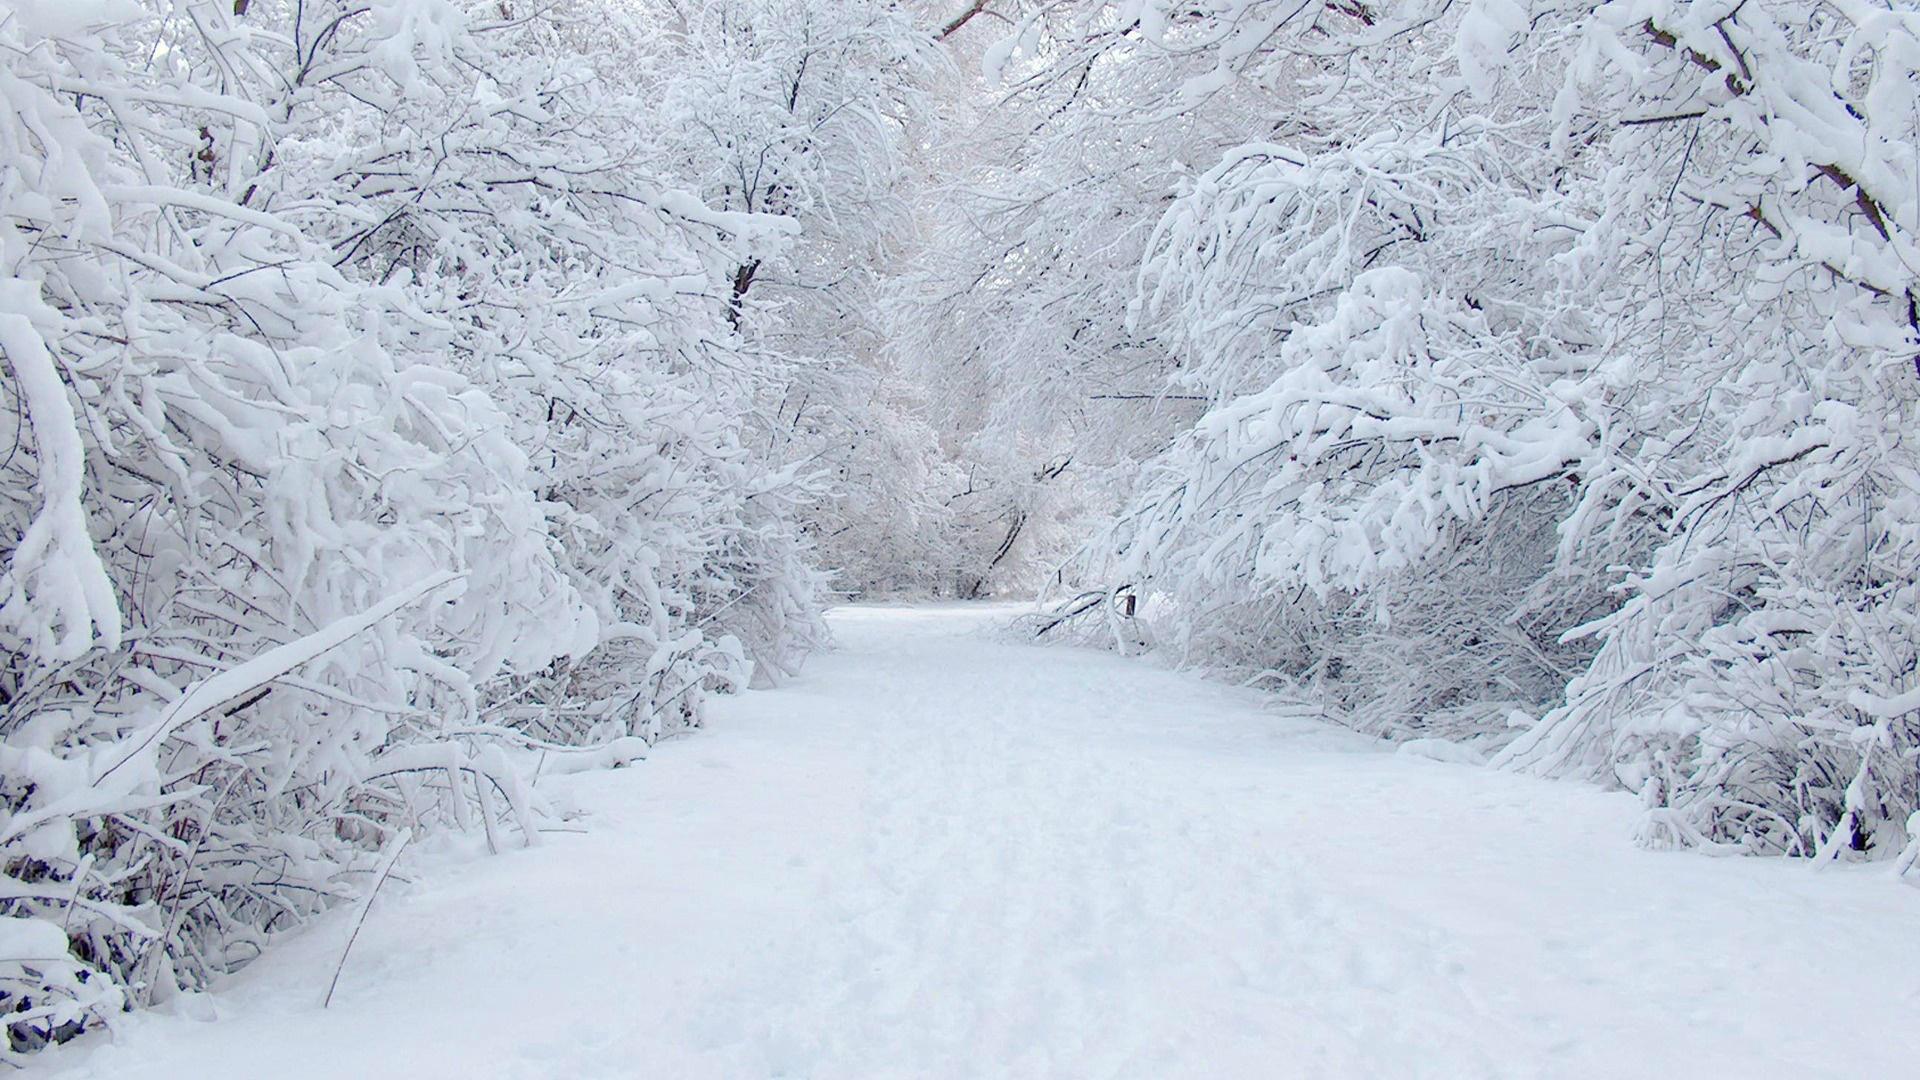 File Name: #813293 Ξ Free Snow Wallpapers